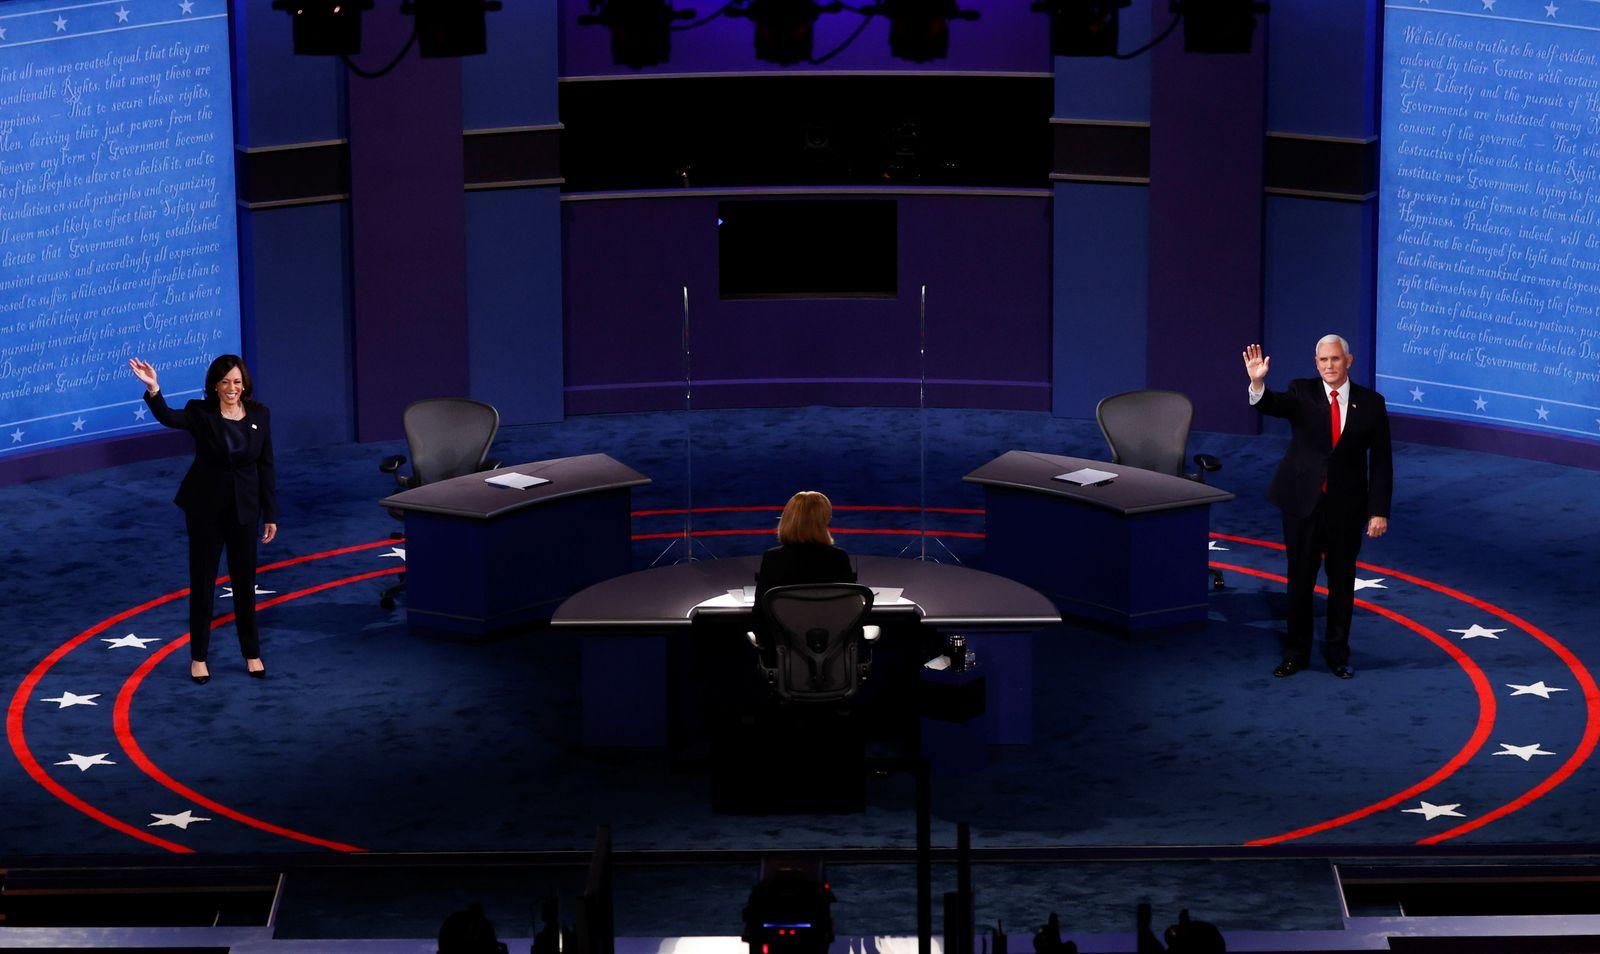 Democratic vice presidential nominee Senator Kamala Harris and U.S. Vice President Mike Pence participate in their 2020 vice presidential campaign debate in Salt Lake City